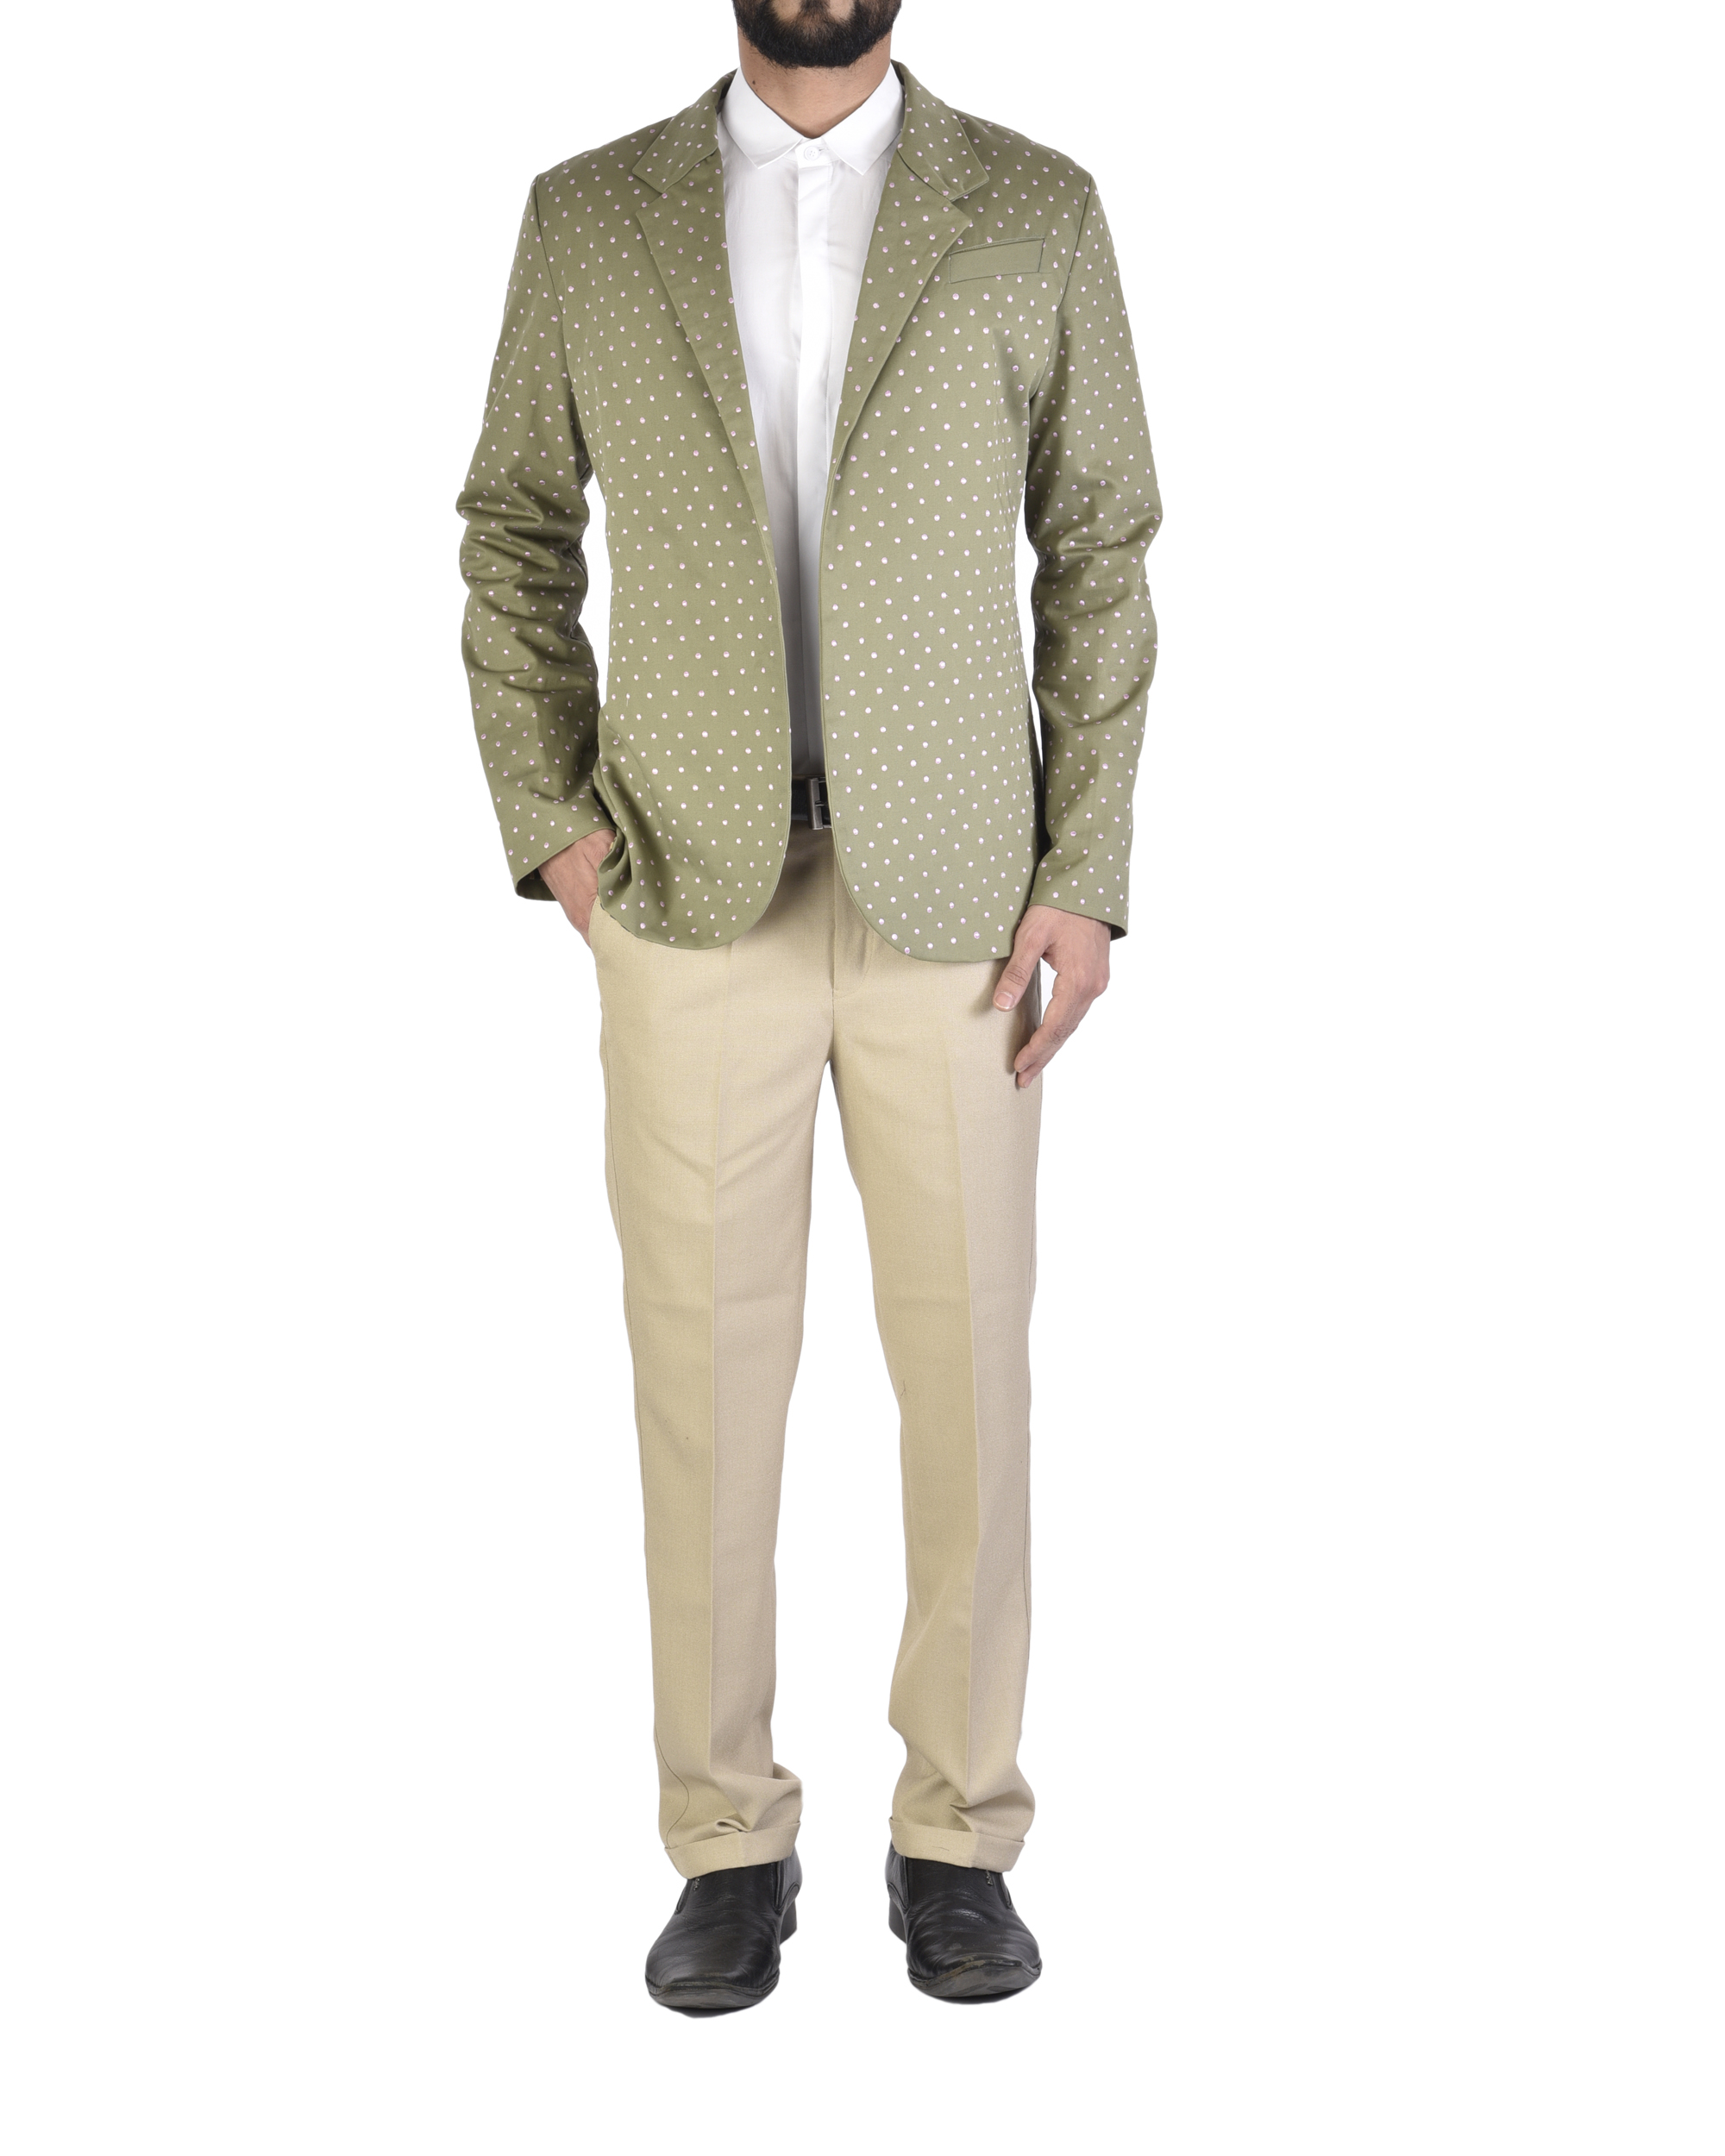 Polka military jacket